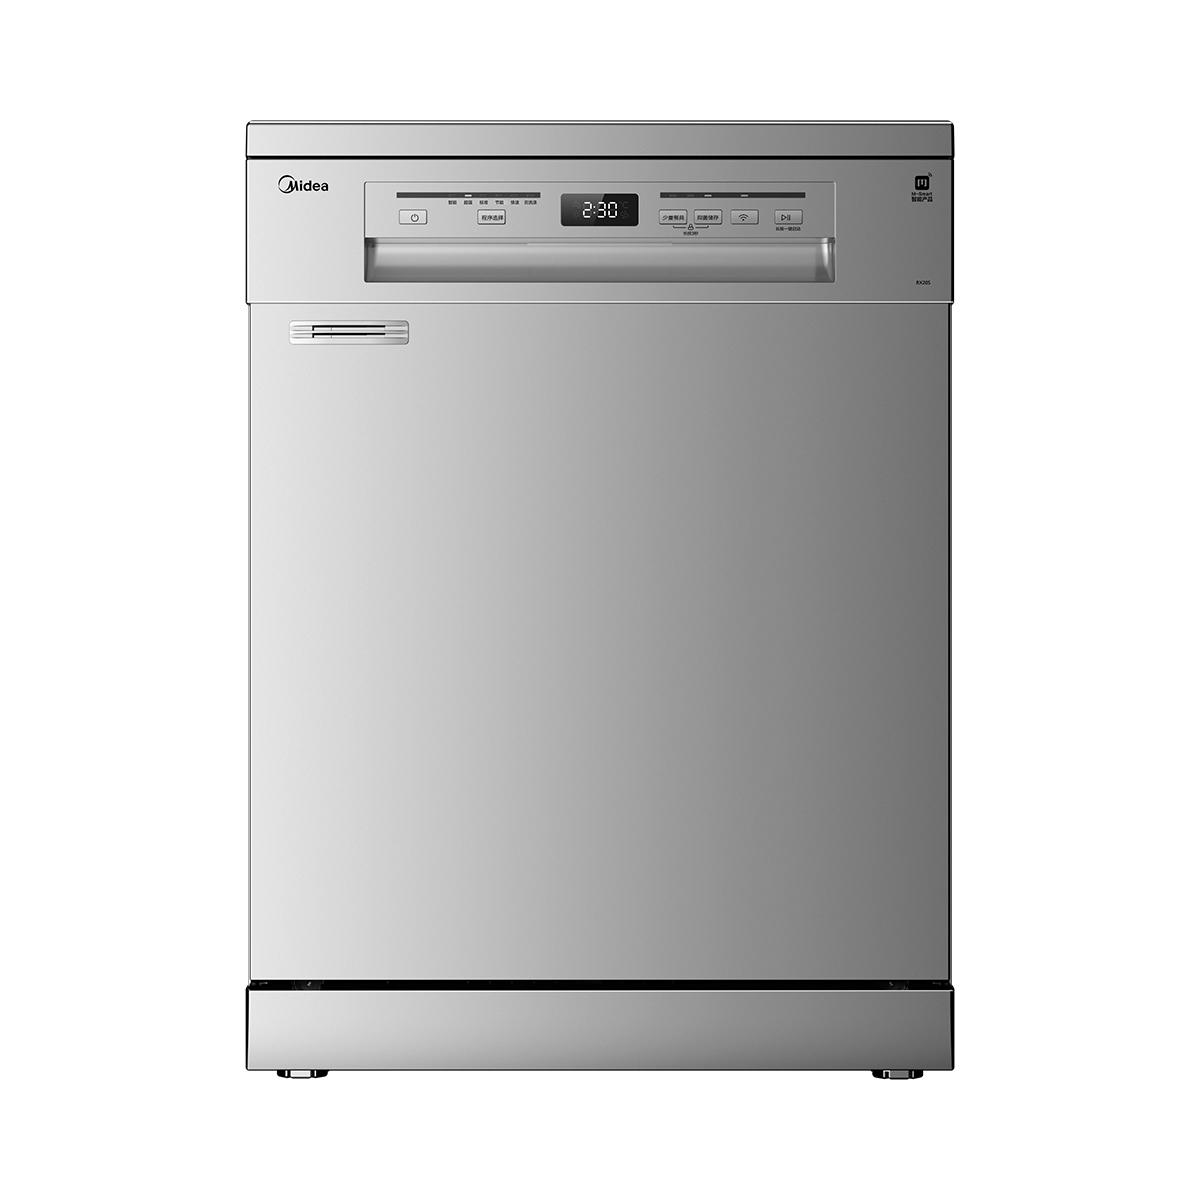 Midea/美的 WQP12-W5201L-CN-R洗碗机 说明书.pdf